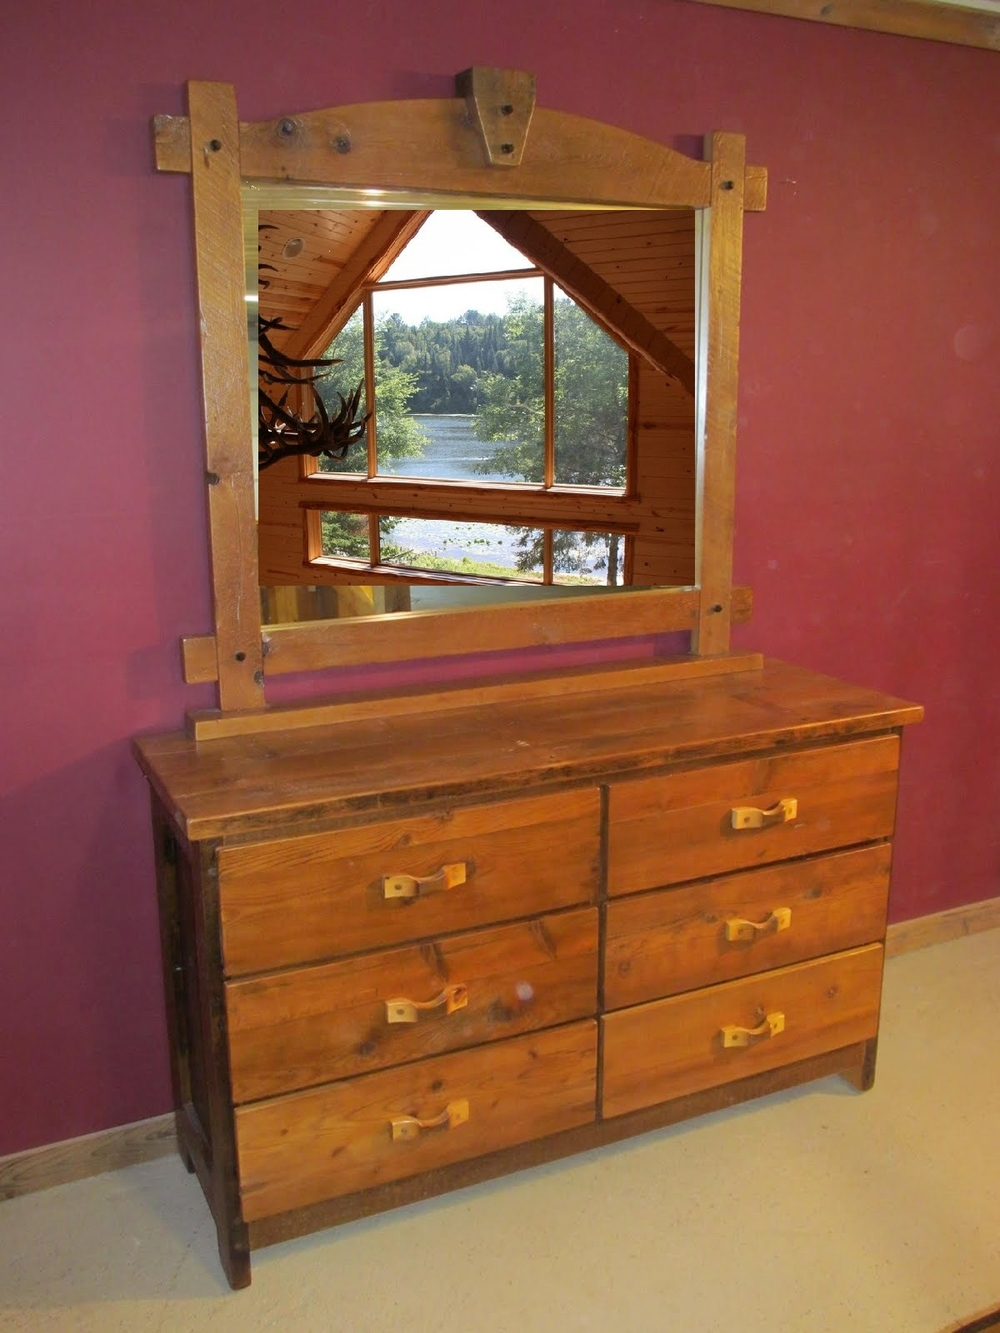 barn-wood-dresser-400.jpg